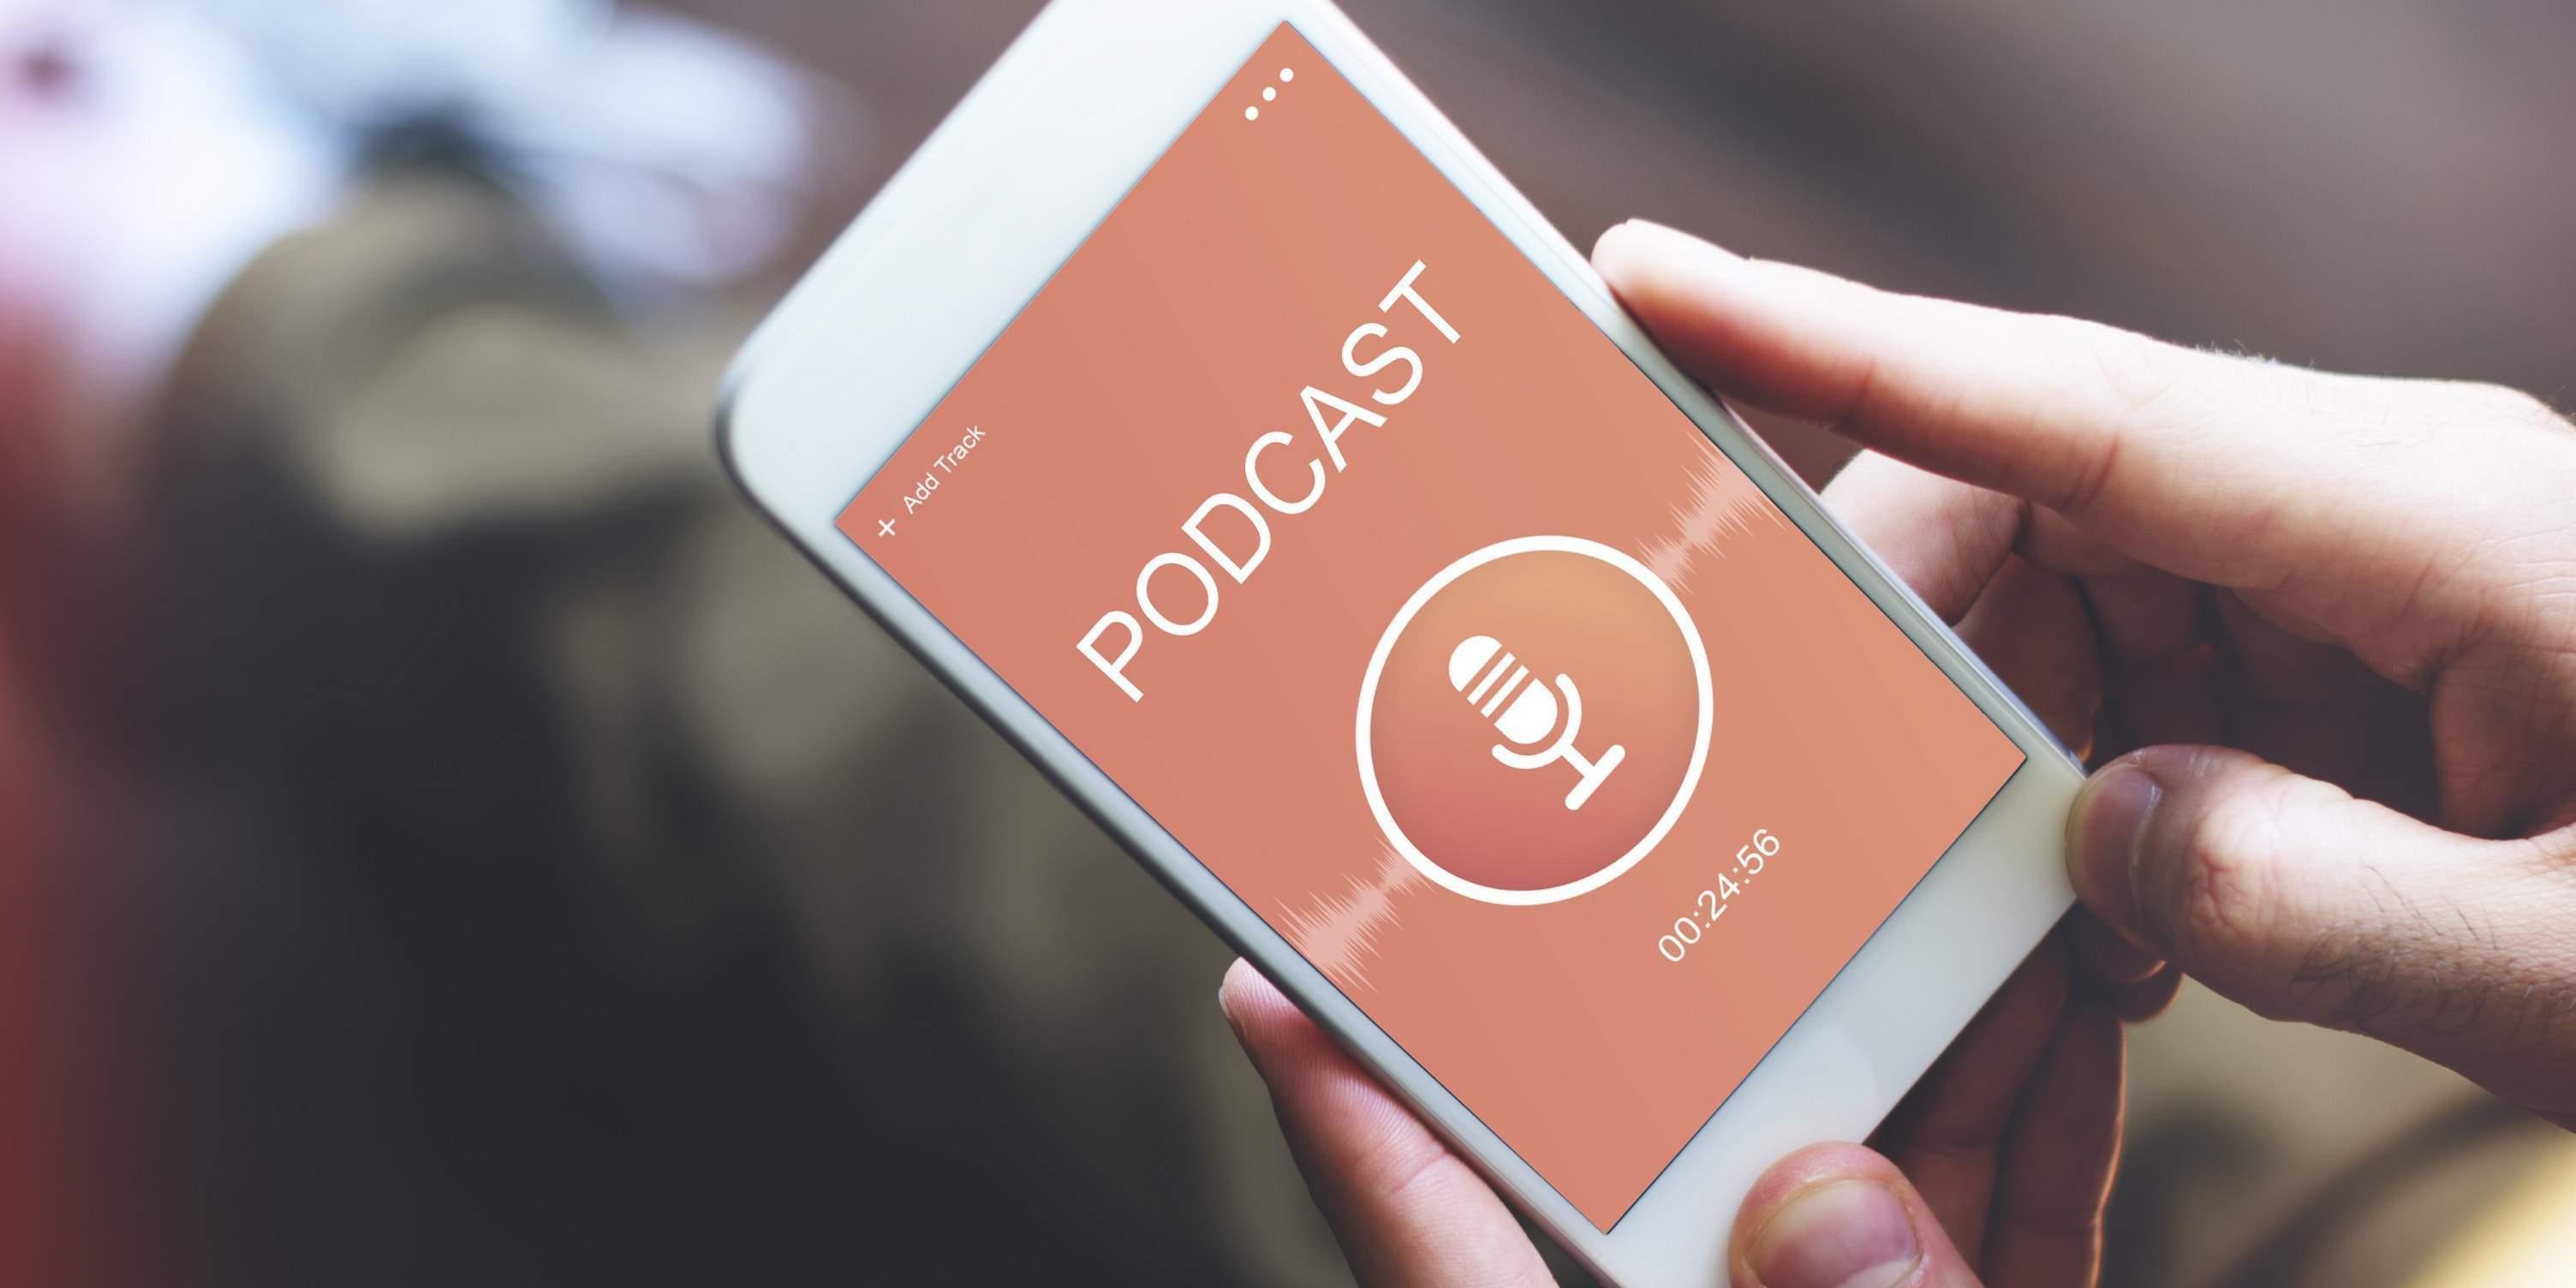 https://www.verdict.co.uk/wp-content/uploads/2017/07/podcasts.jpg